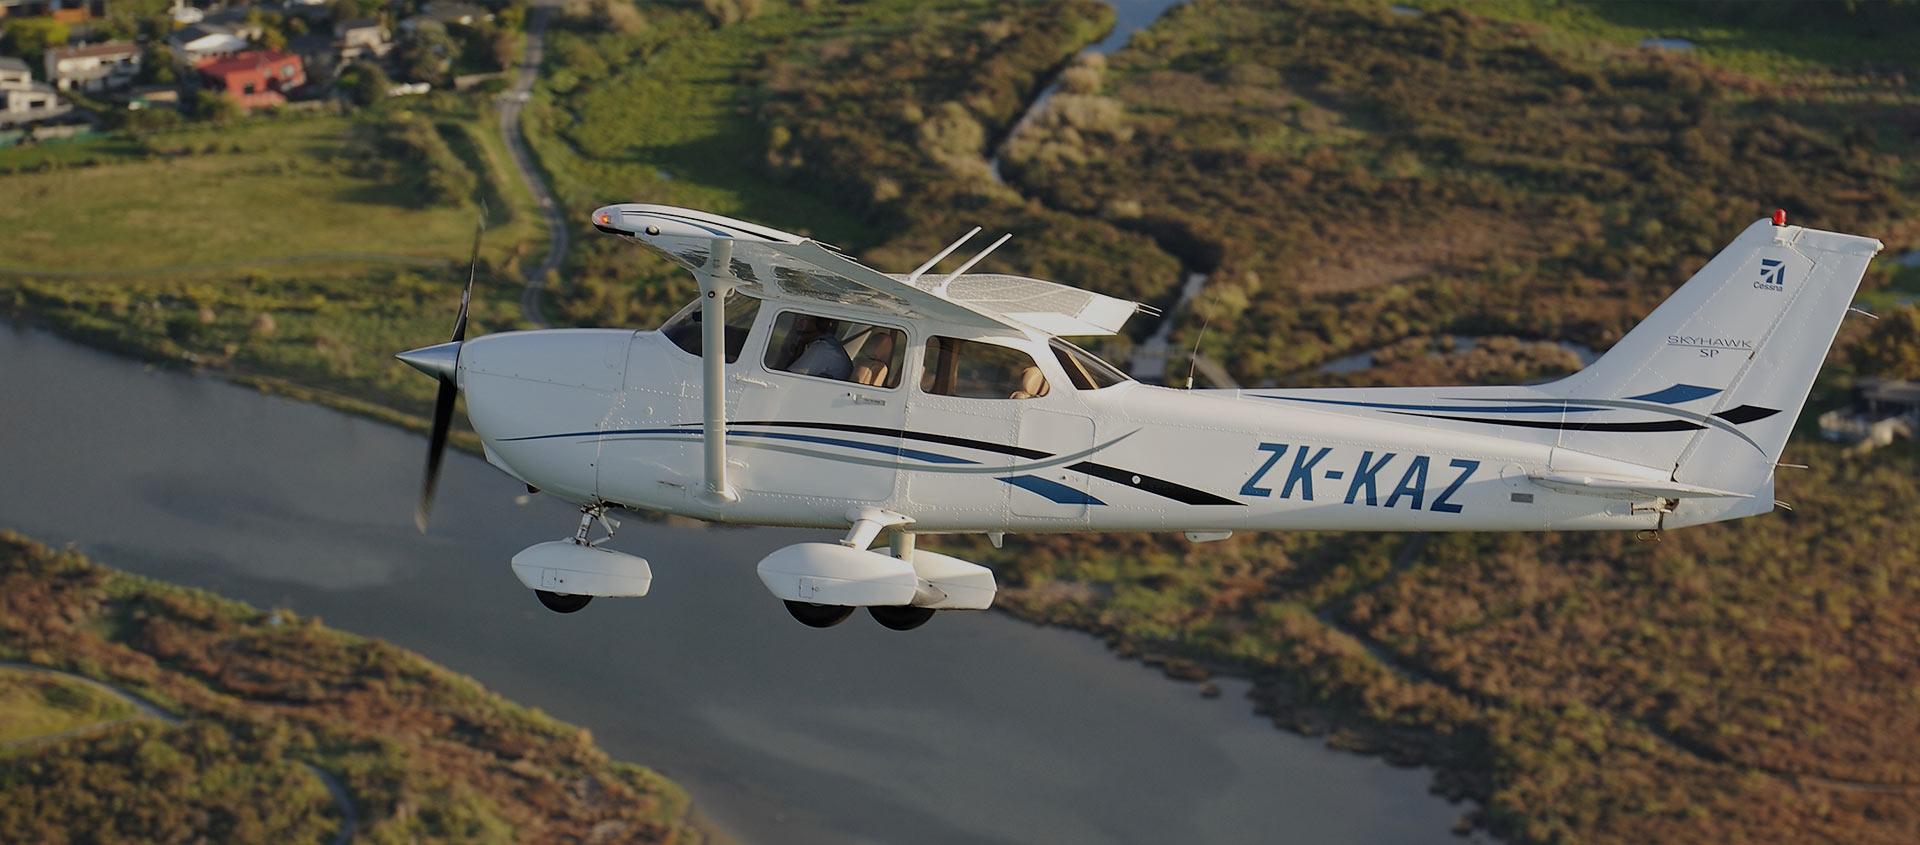 Pilot your own plane